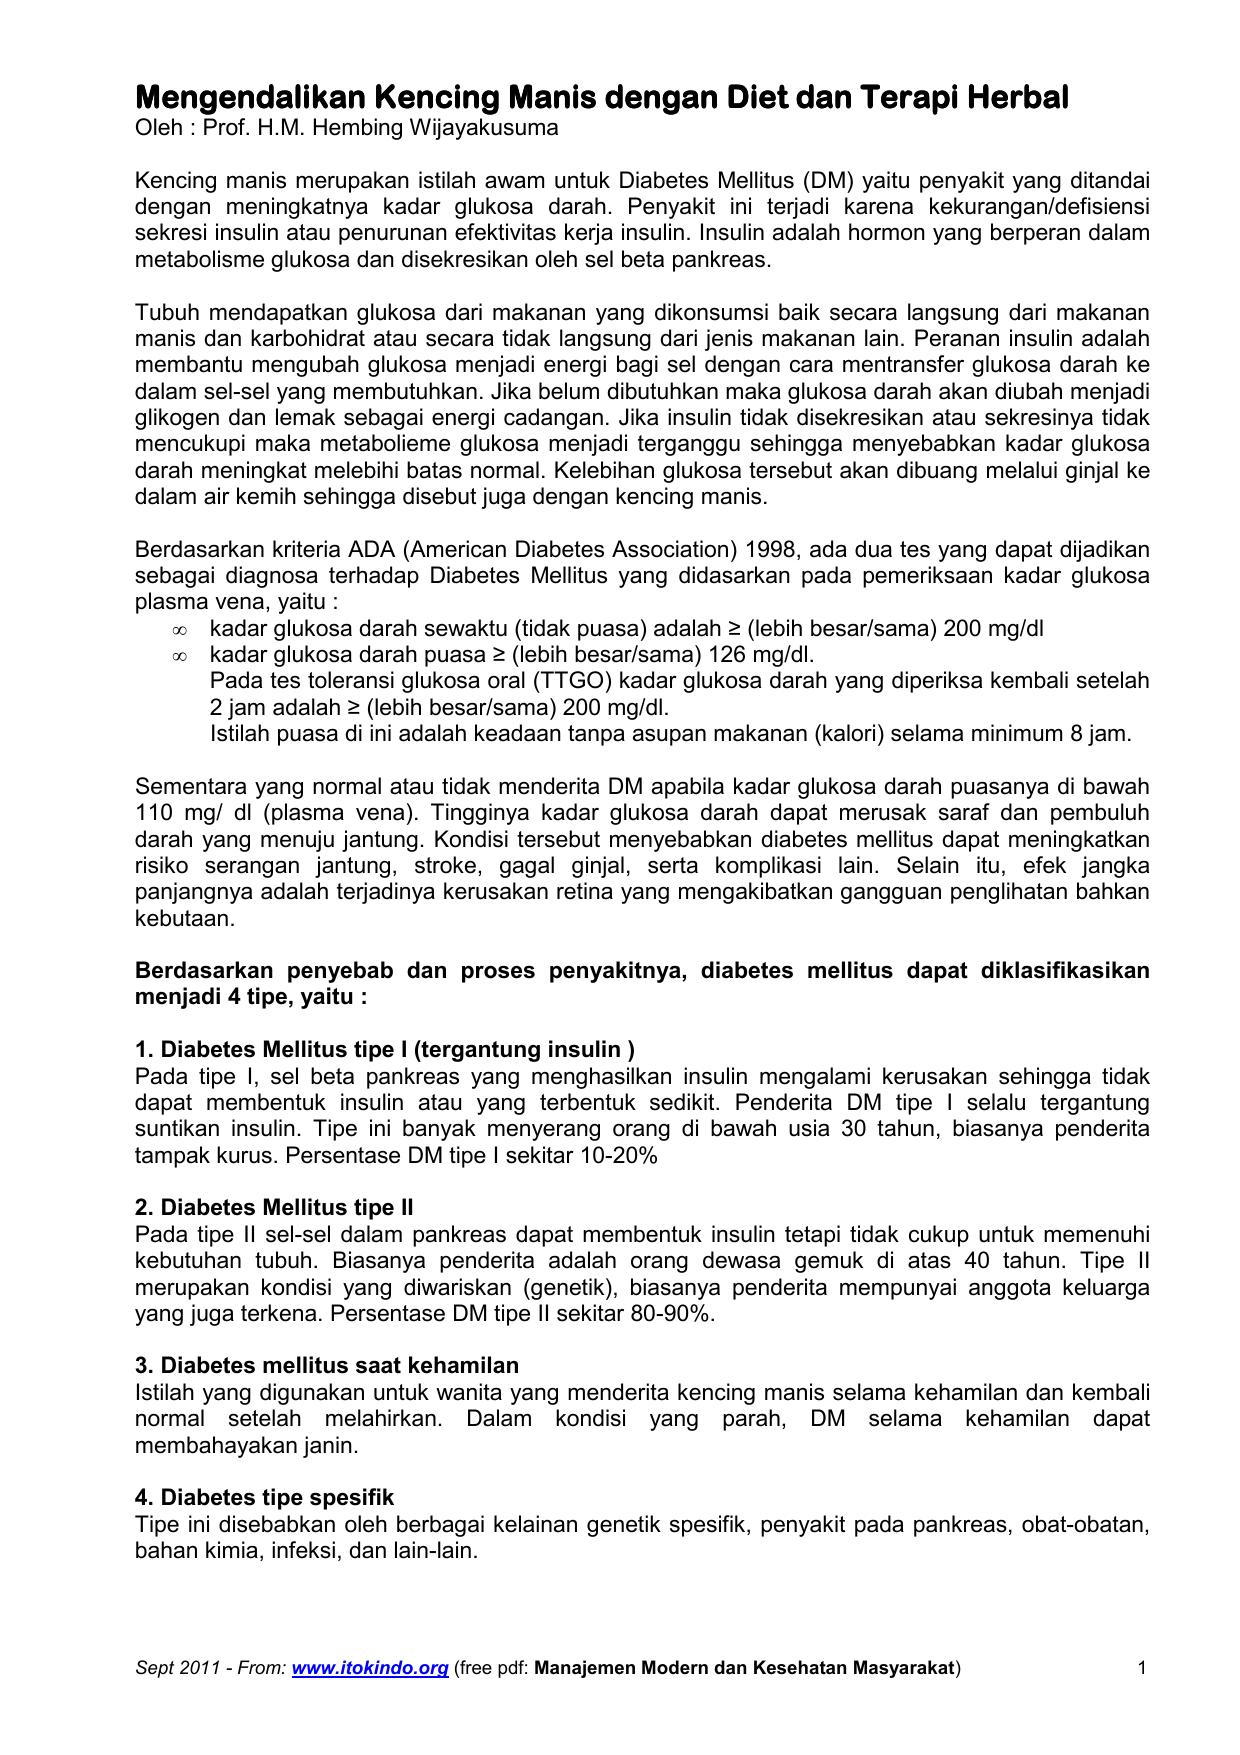 obat herbal diabetes melitus pdf